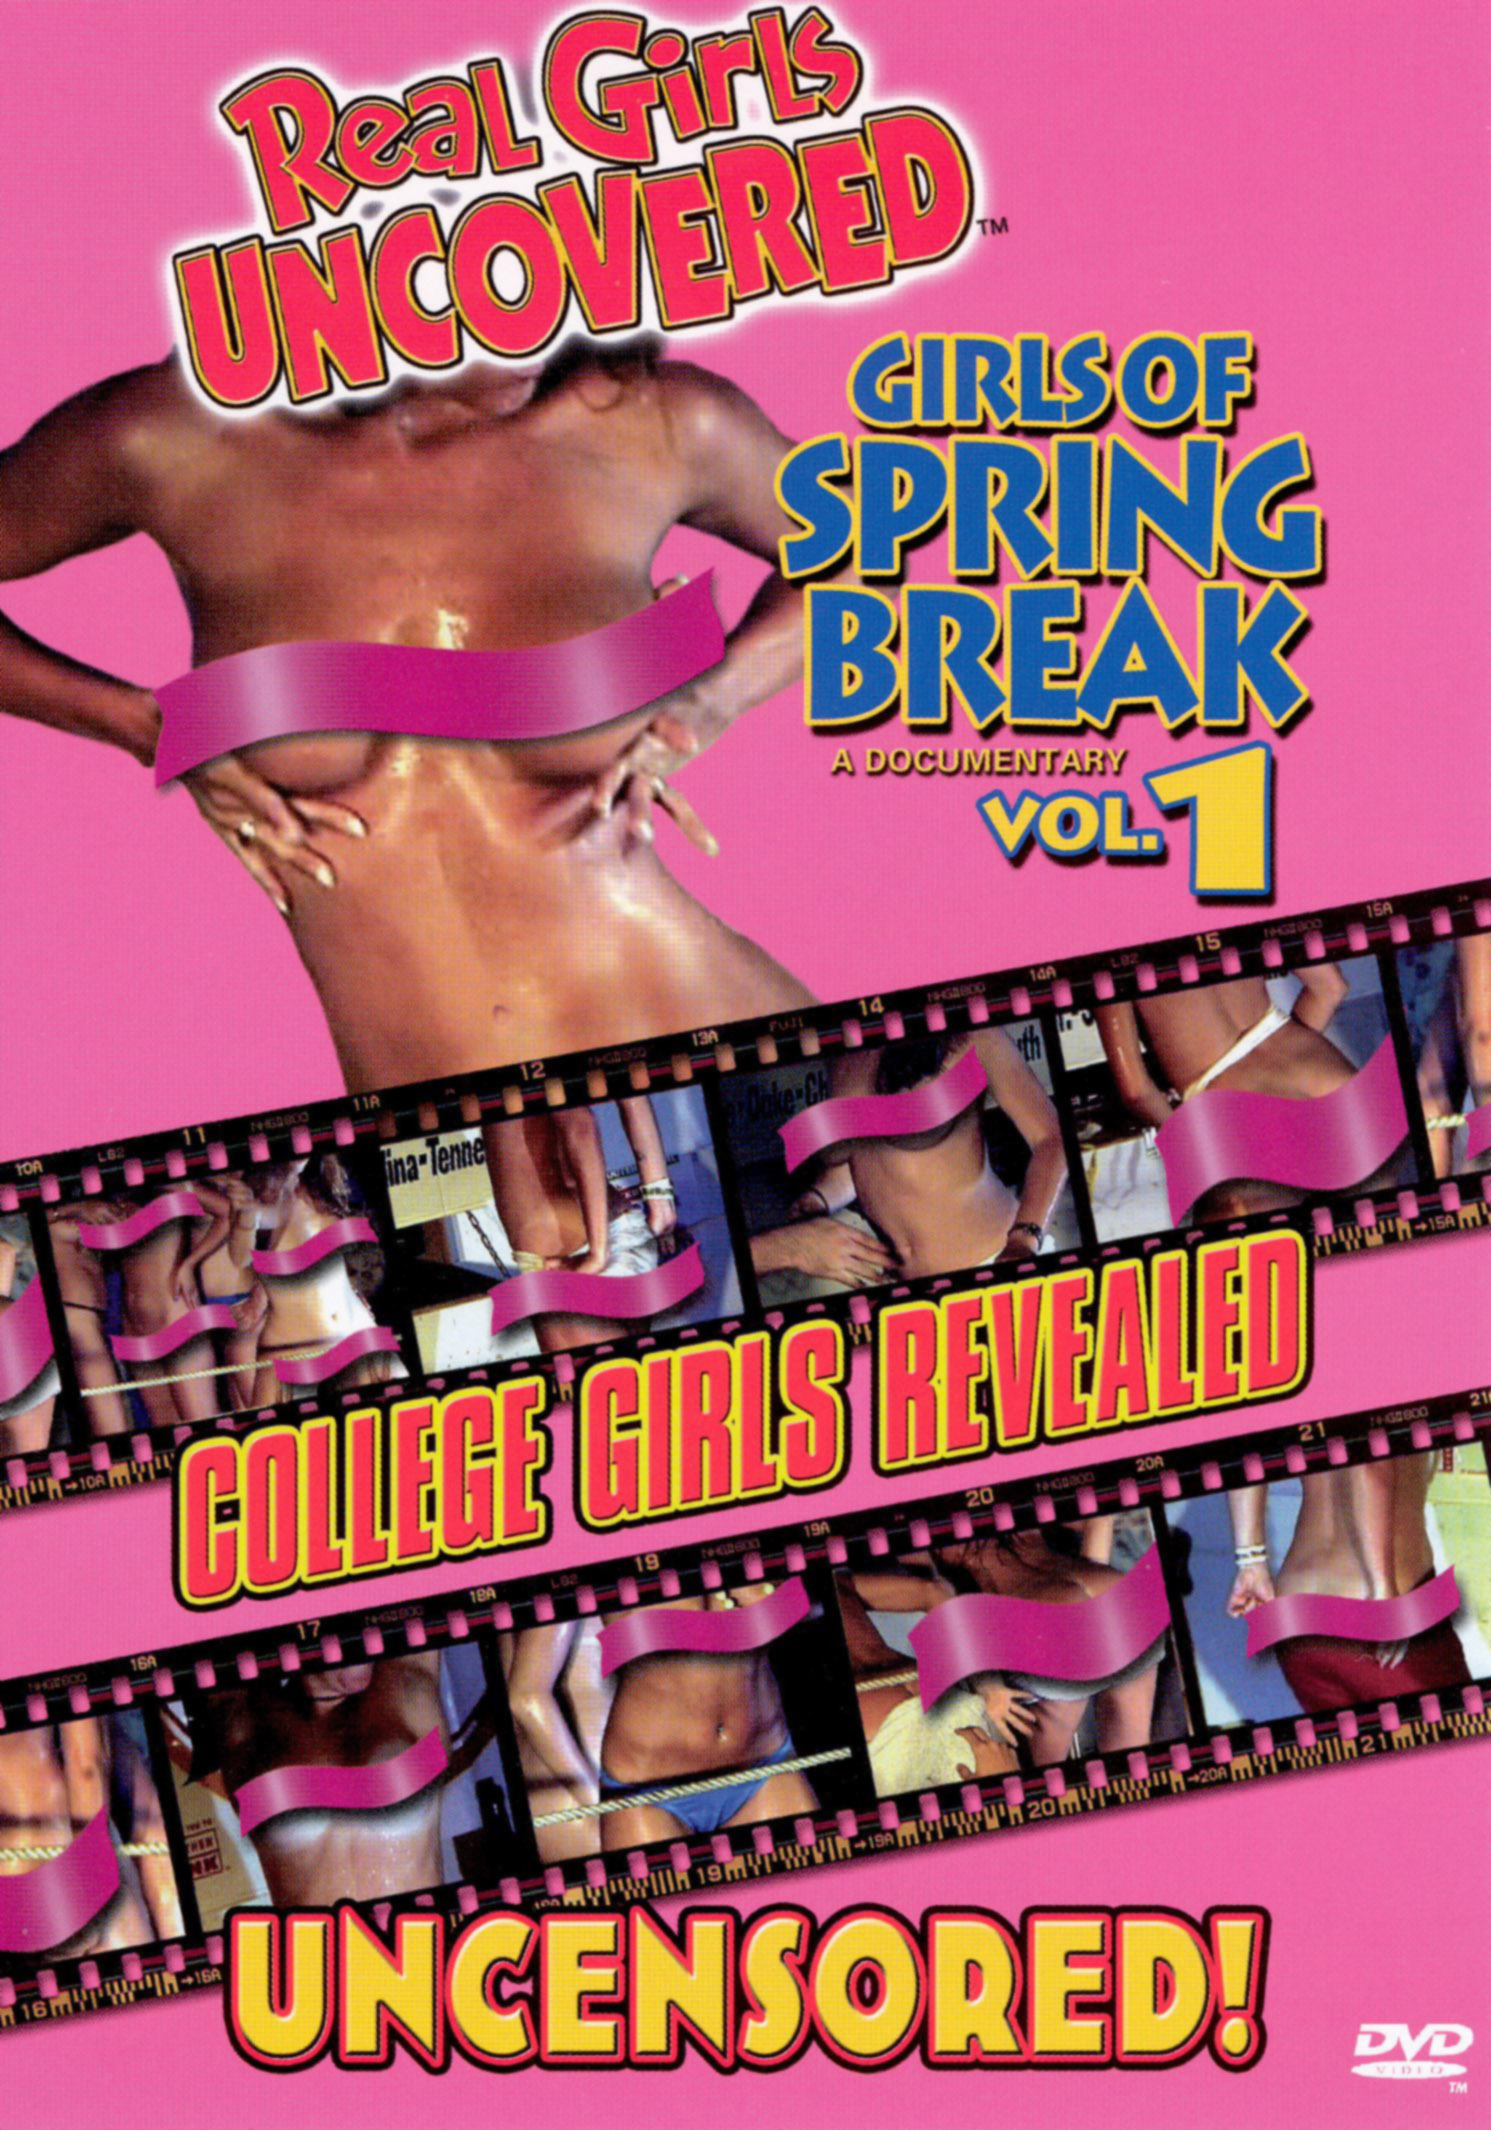 Real Girls Uncovered: Girls of Spring Break, Vol. 1